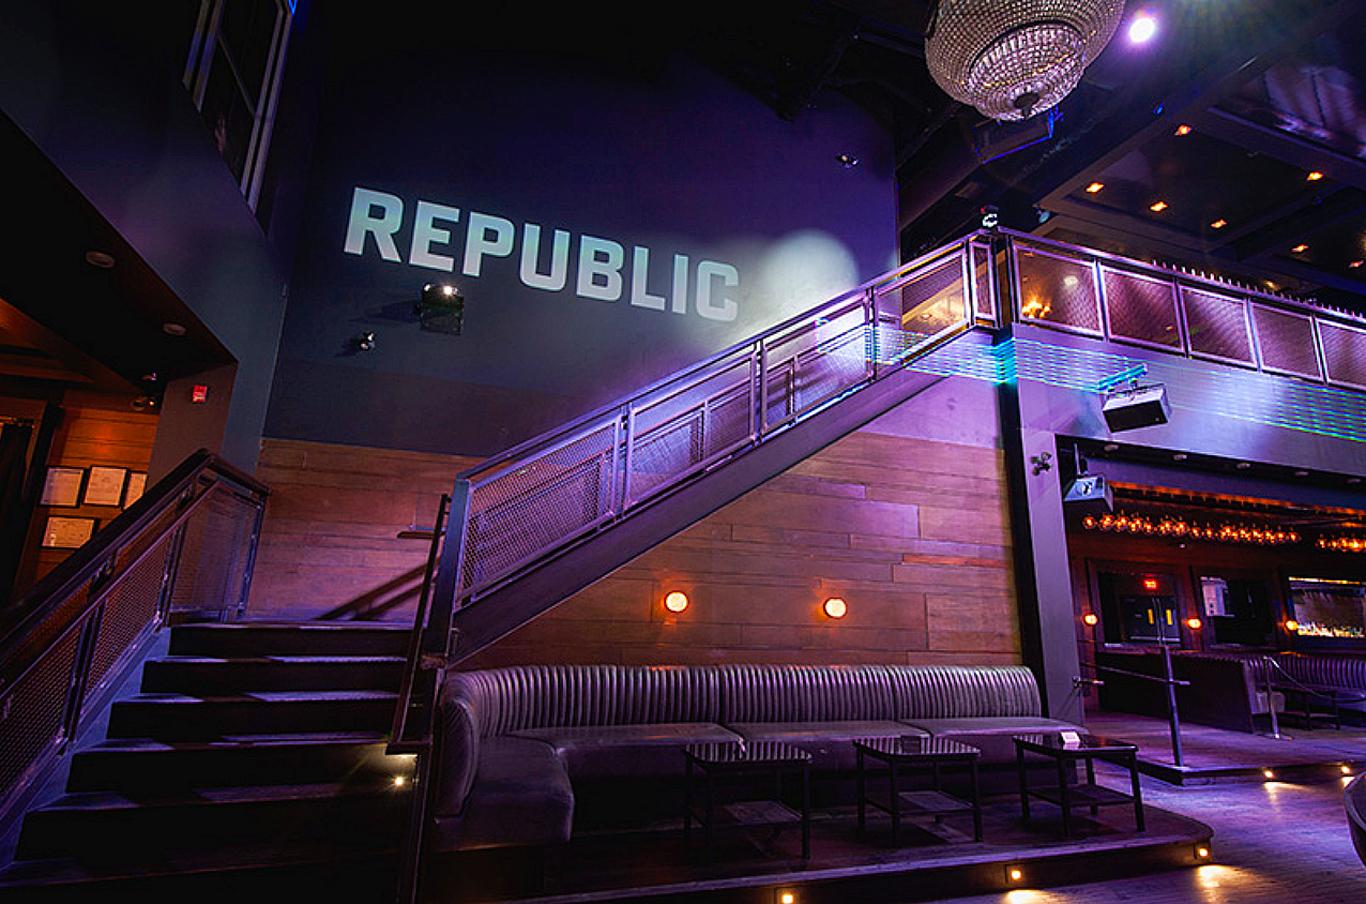 Republic-Nightclub-06.jpg